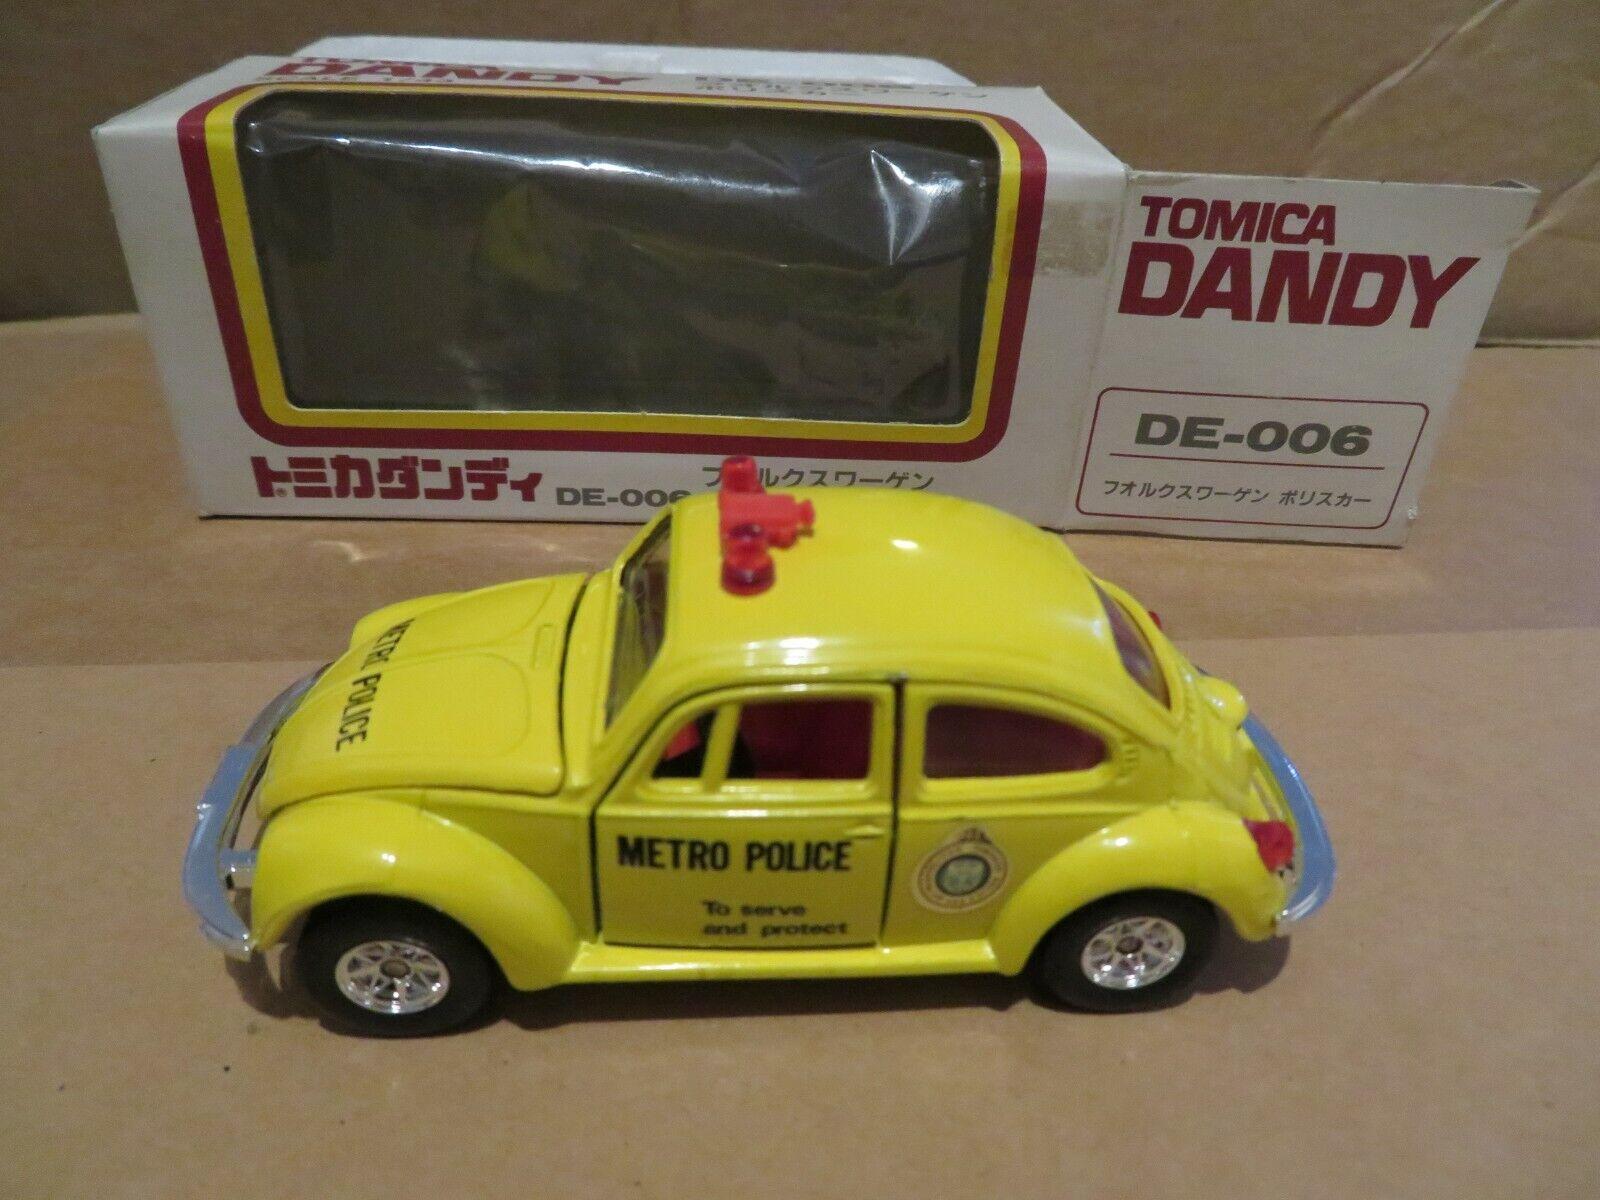 Tomy Tomica Dandy VW Volkswagen Beetle Metro Police Car DE-006 1 43 Nice w Box